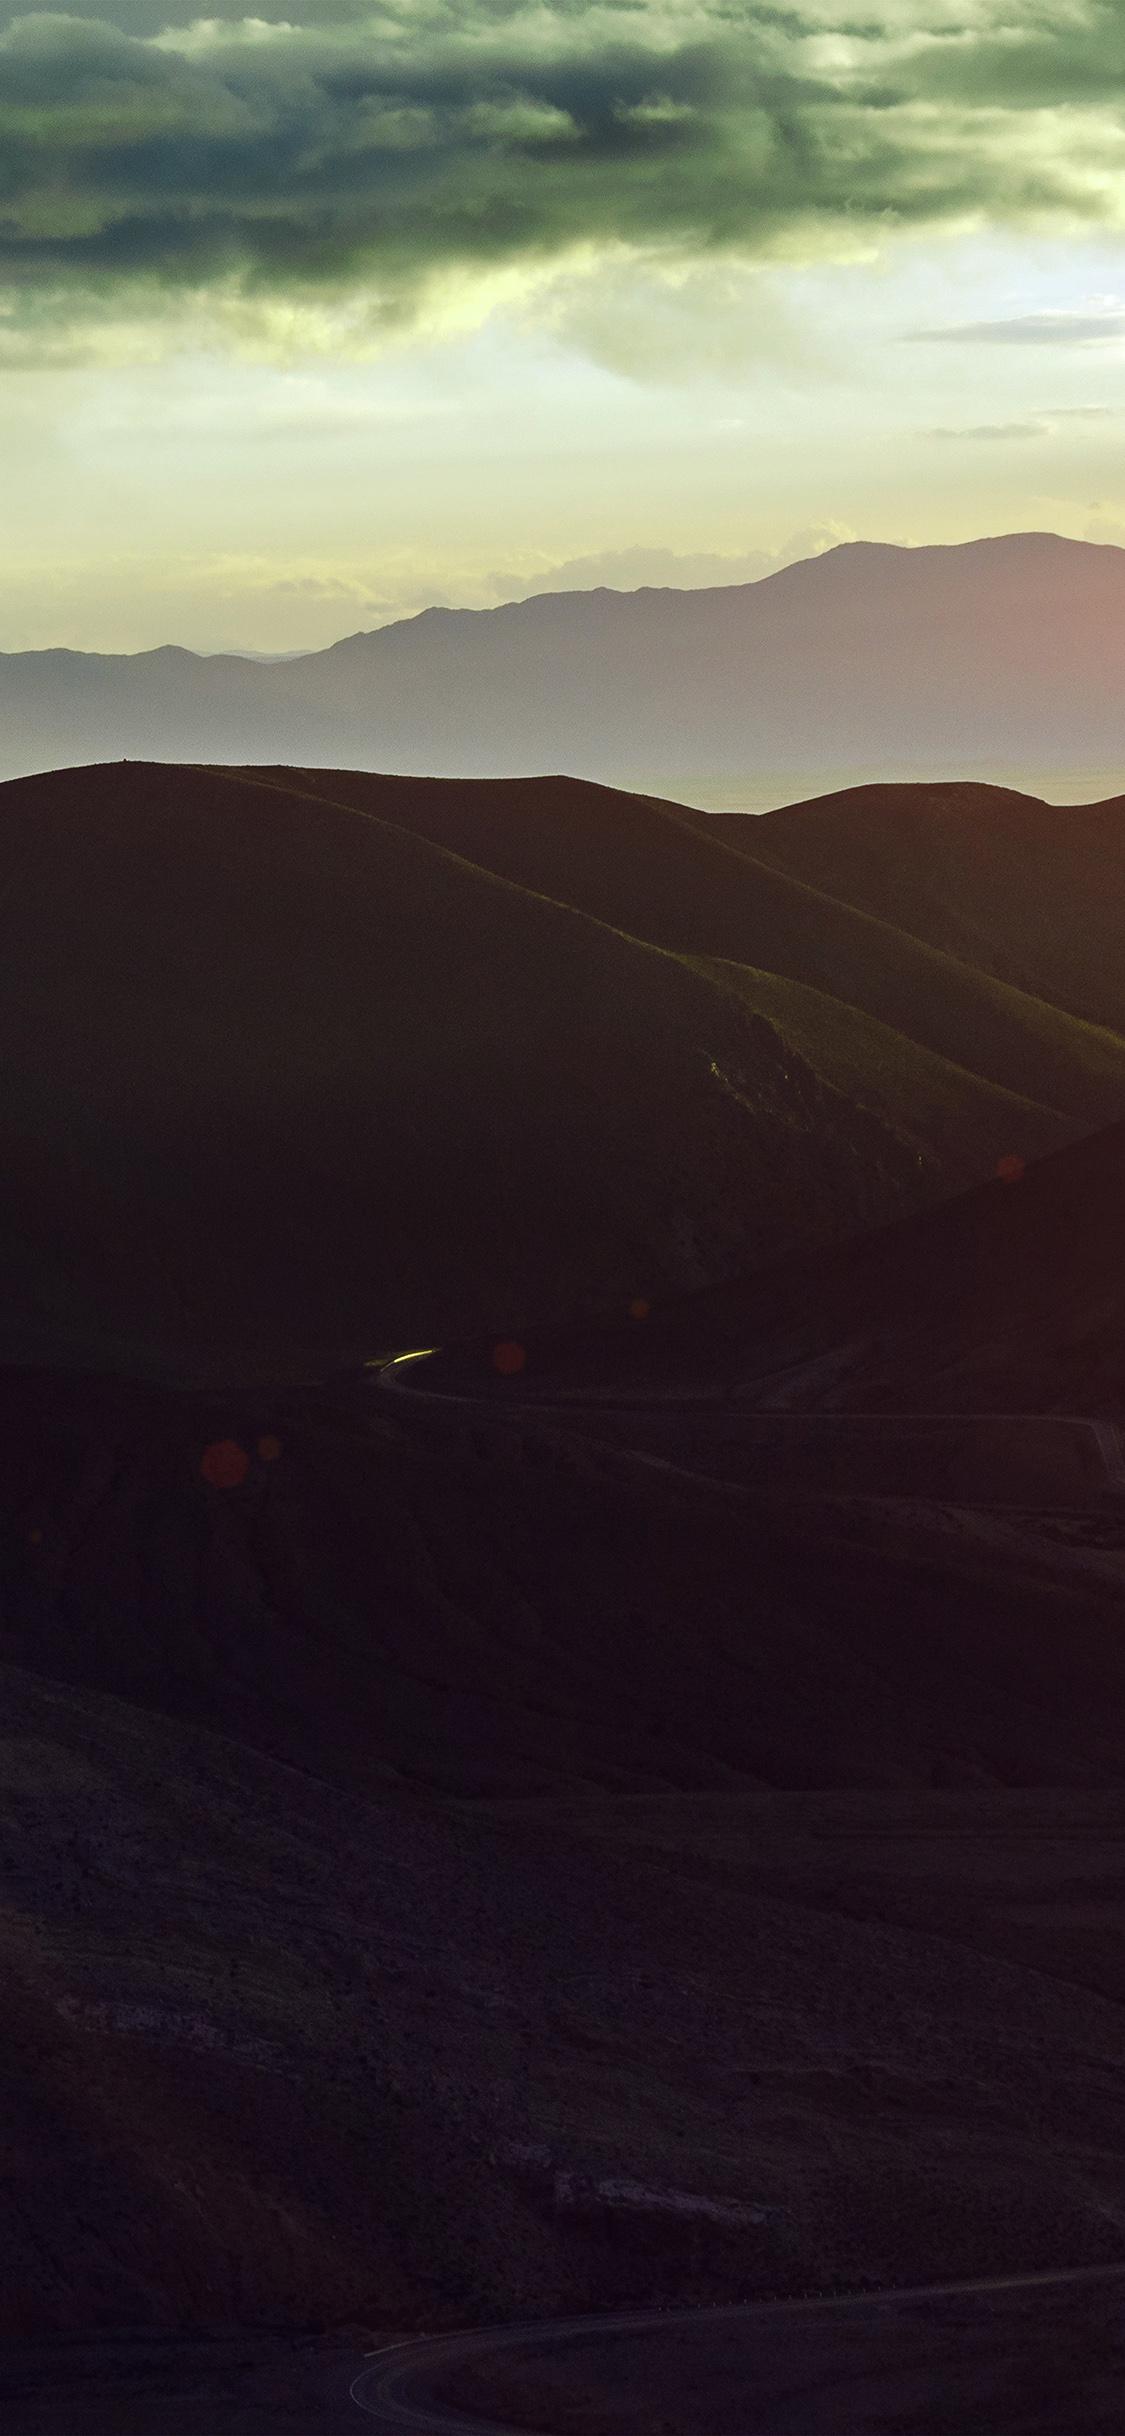 iPhonexpapers.com-Apple-iPhone-wallpaper-ni28-mountain-green-nature-dark-flare